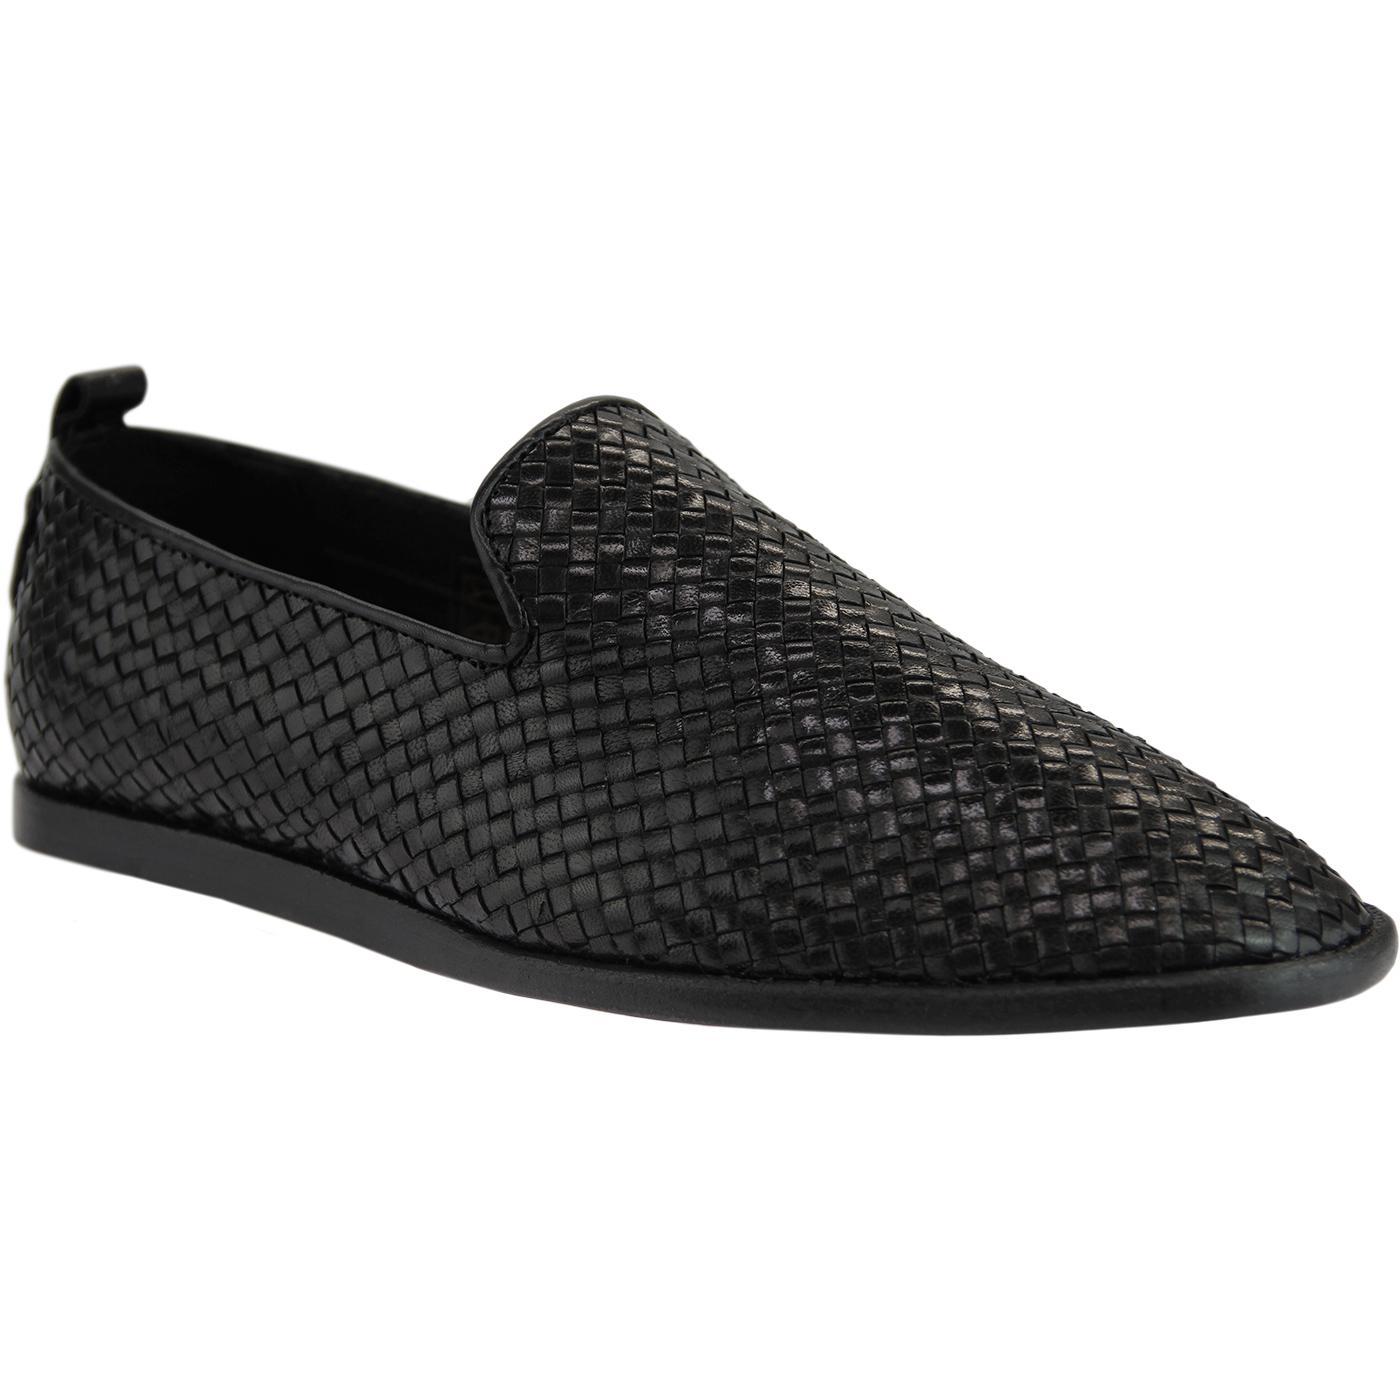 Ipanema HUDSON Retro Basket Weave Slip-On Shoes B